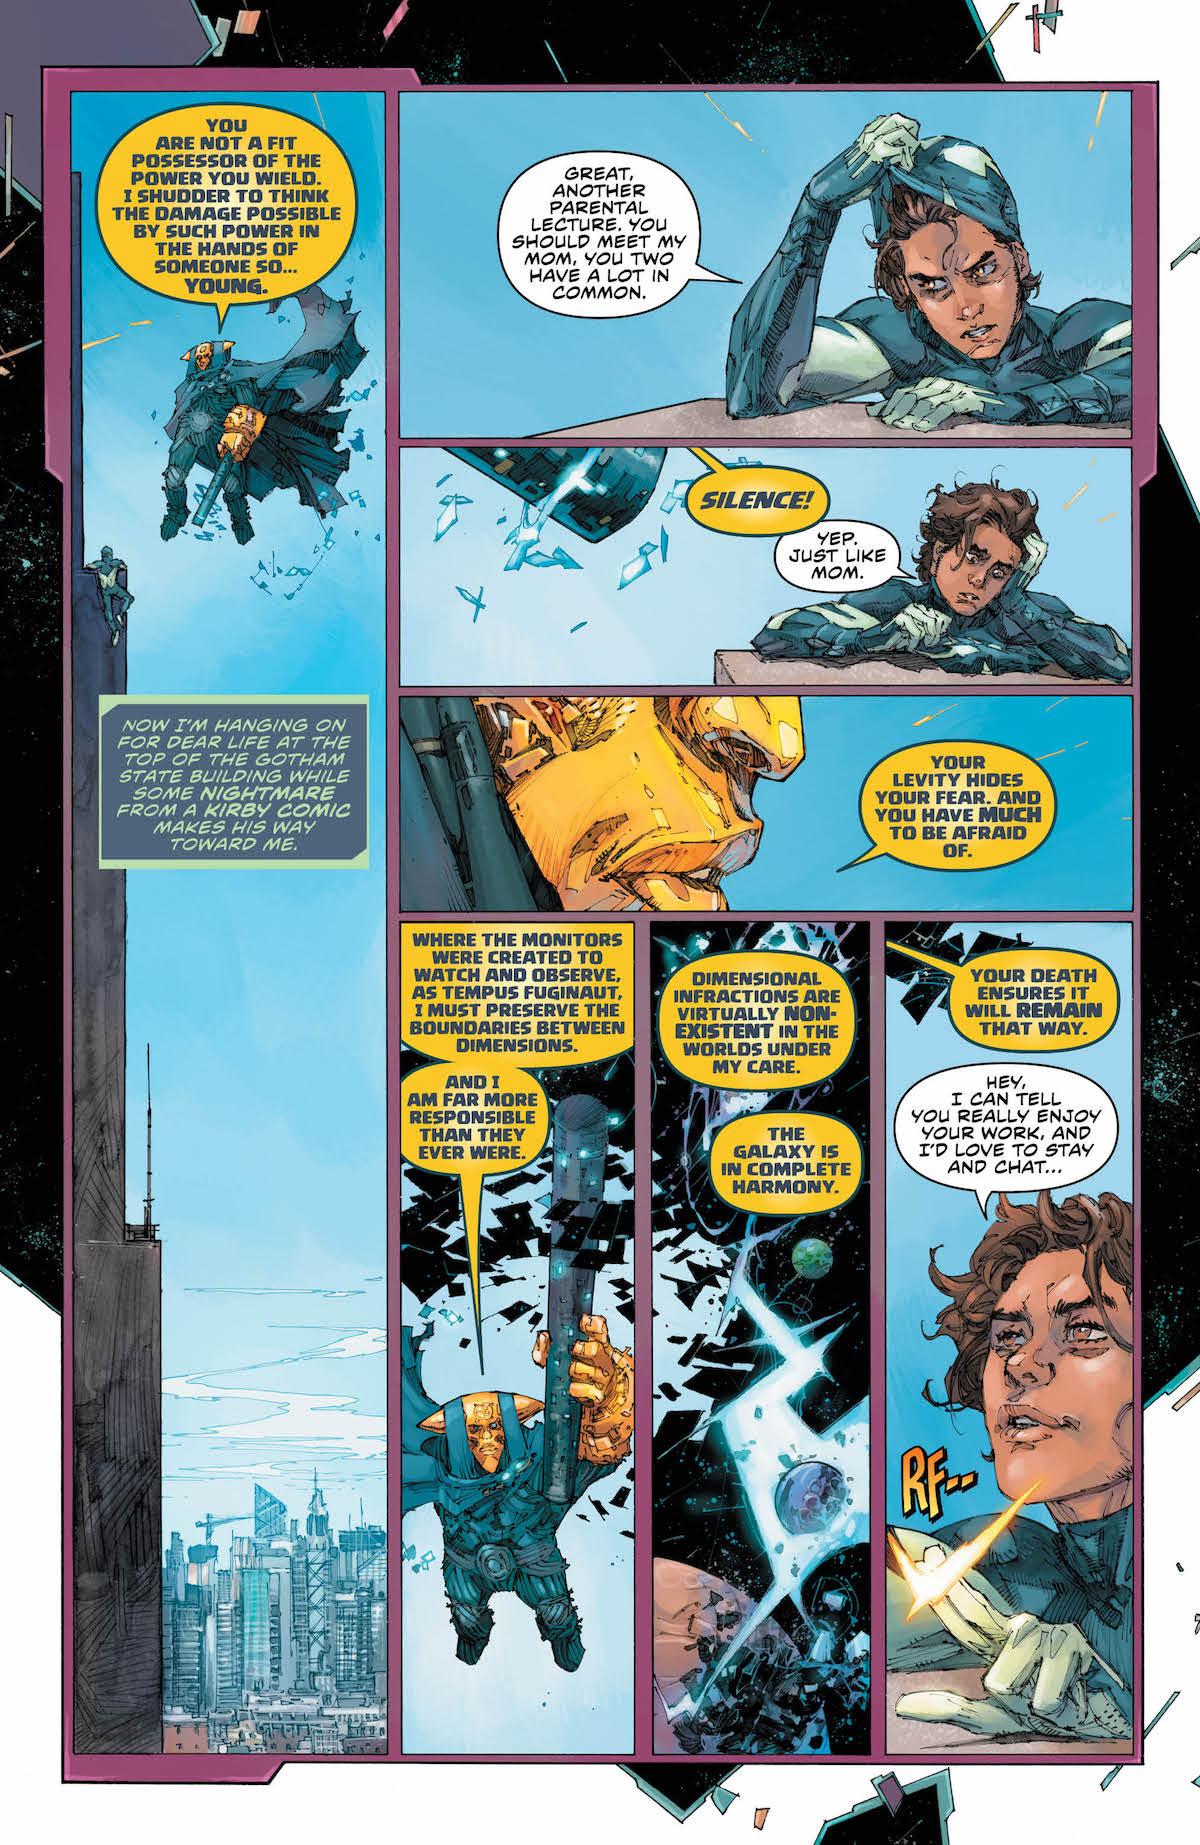 Sideways #2 page 2